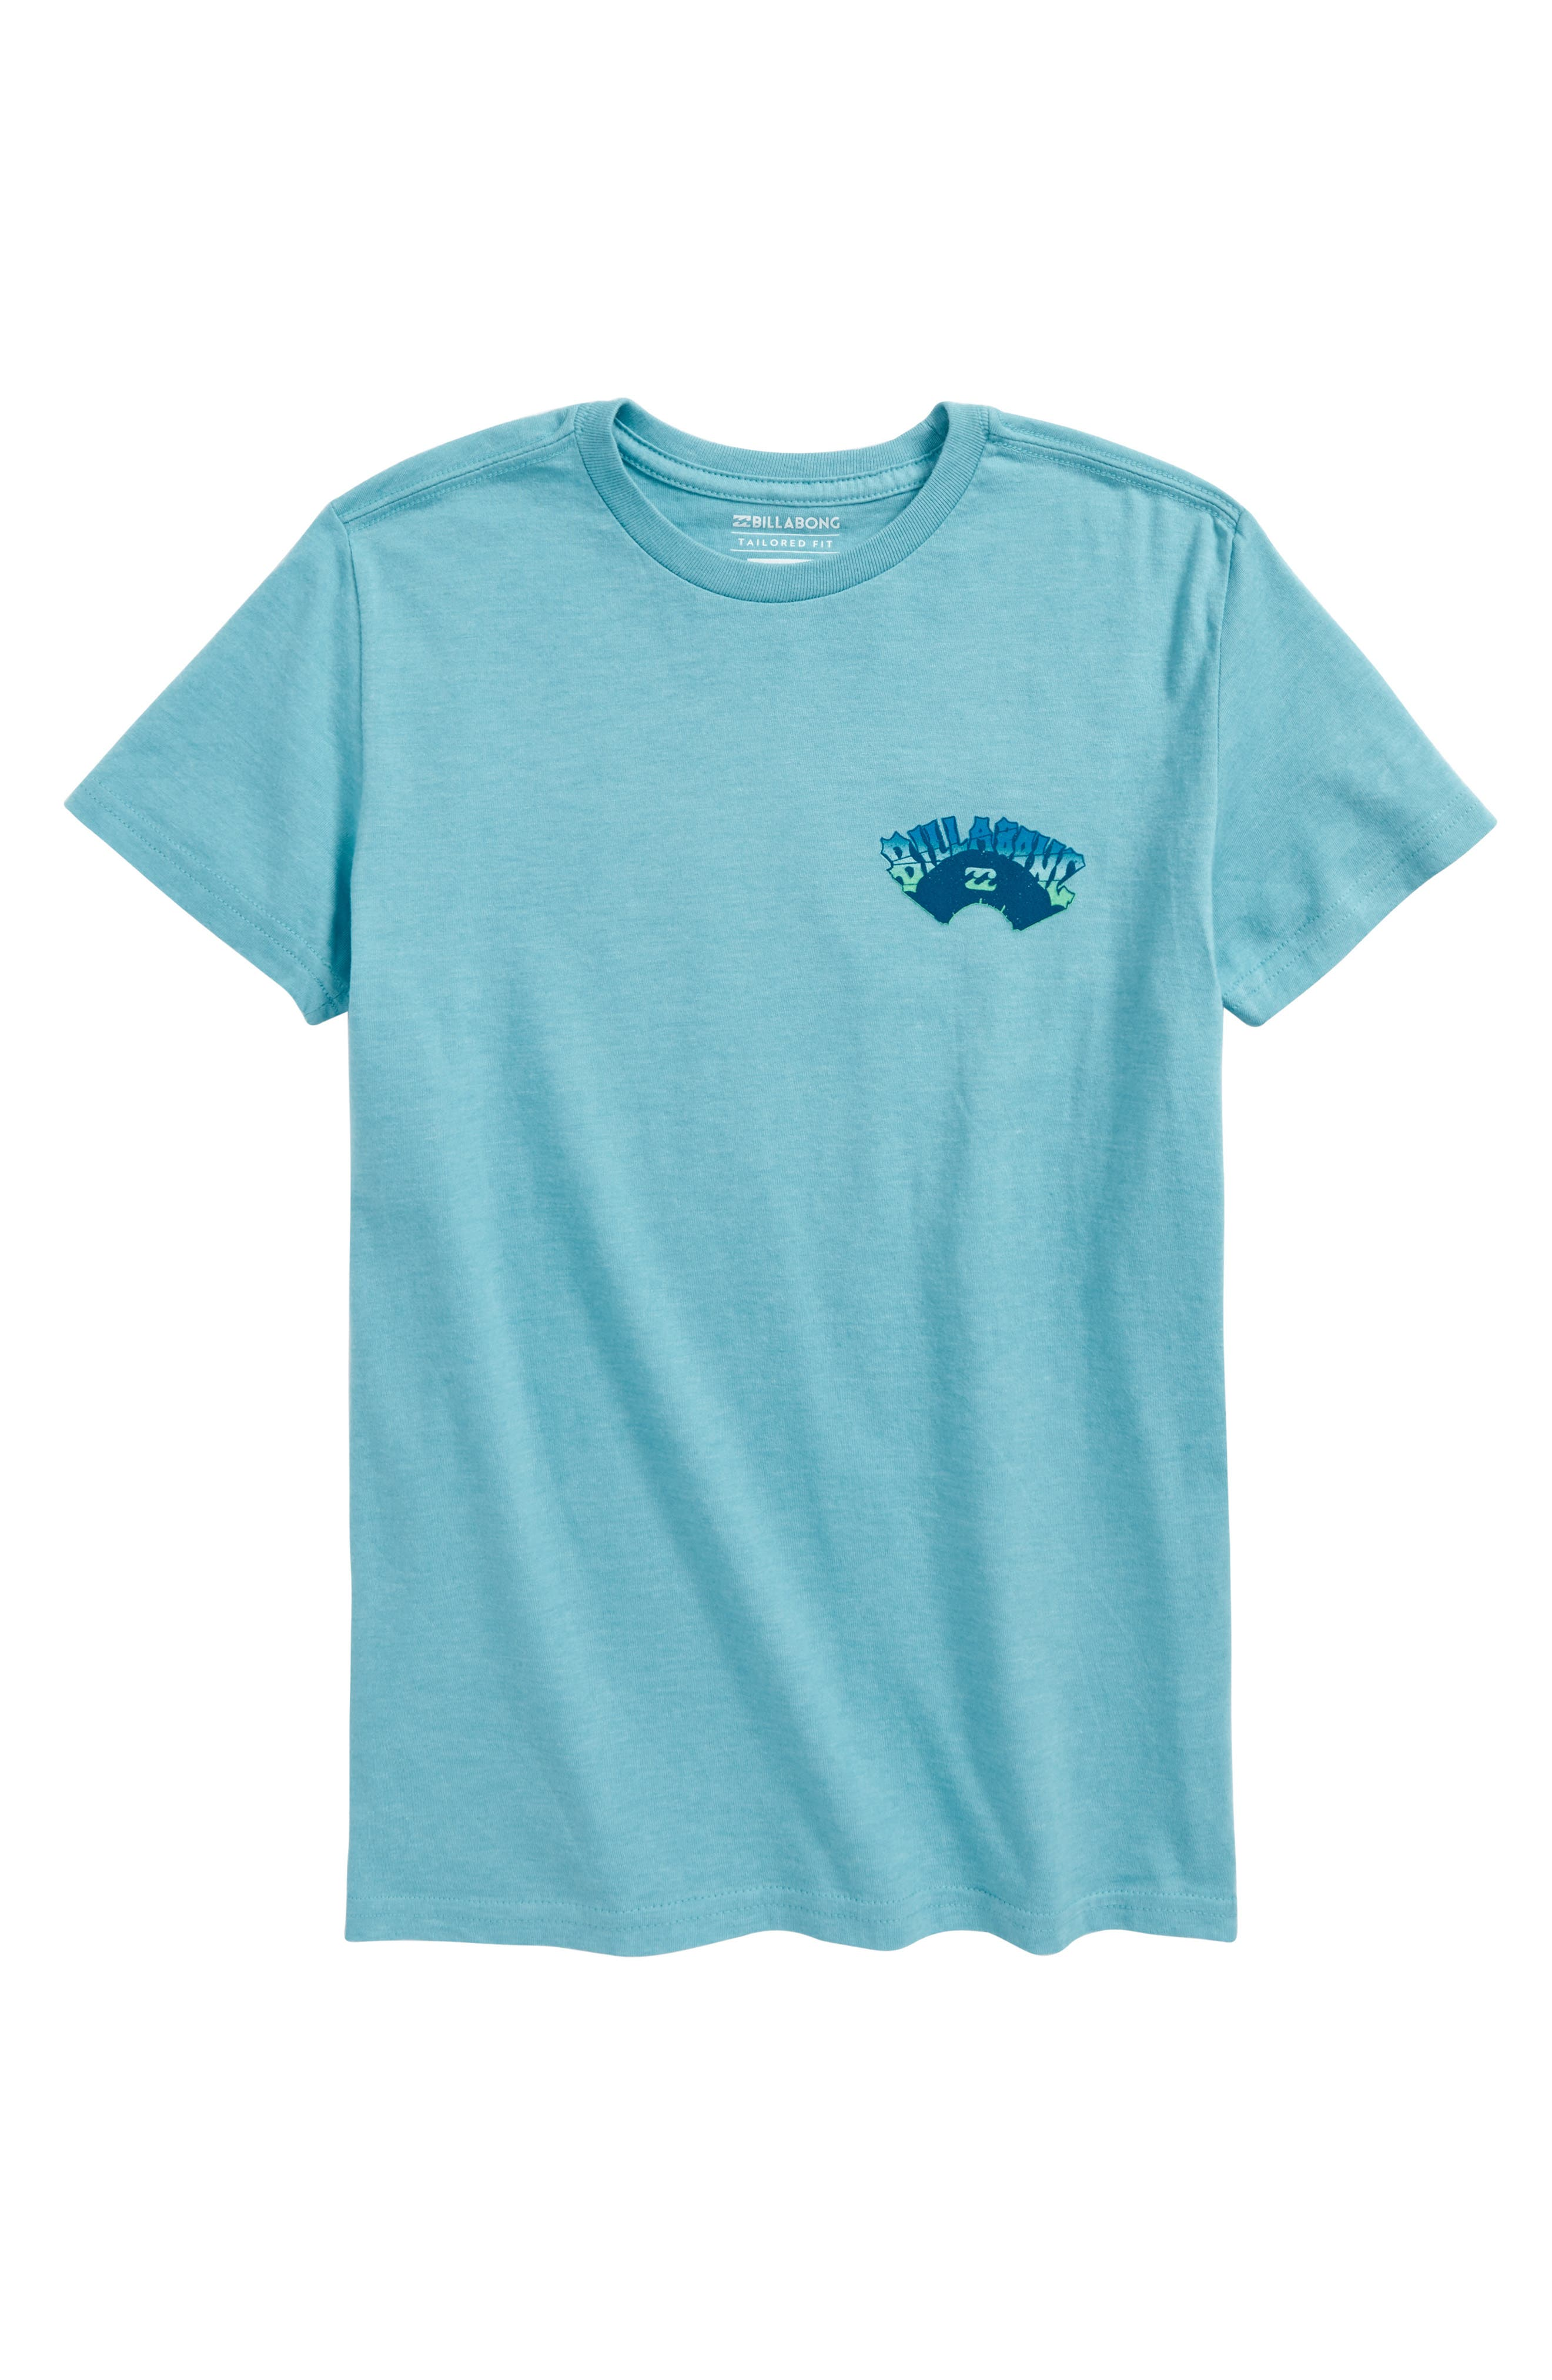 Alternate Image 1 Selected - Billabong Dicer Graphic T-Shirt (Big Boys)